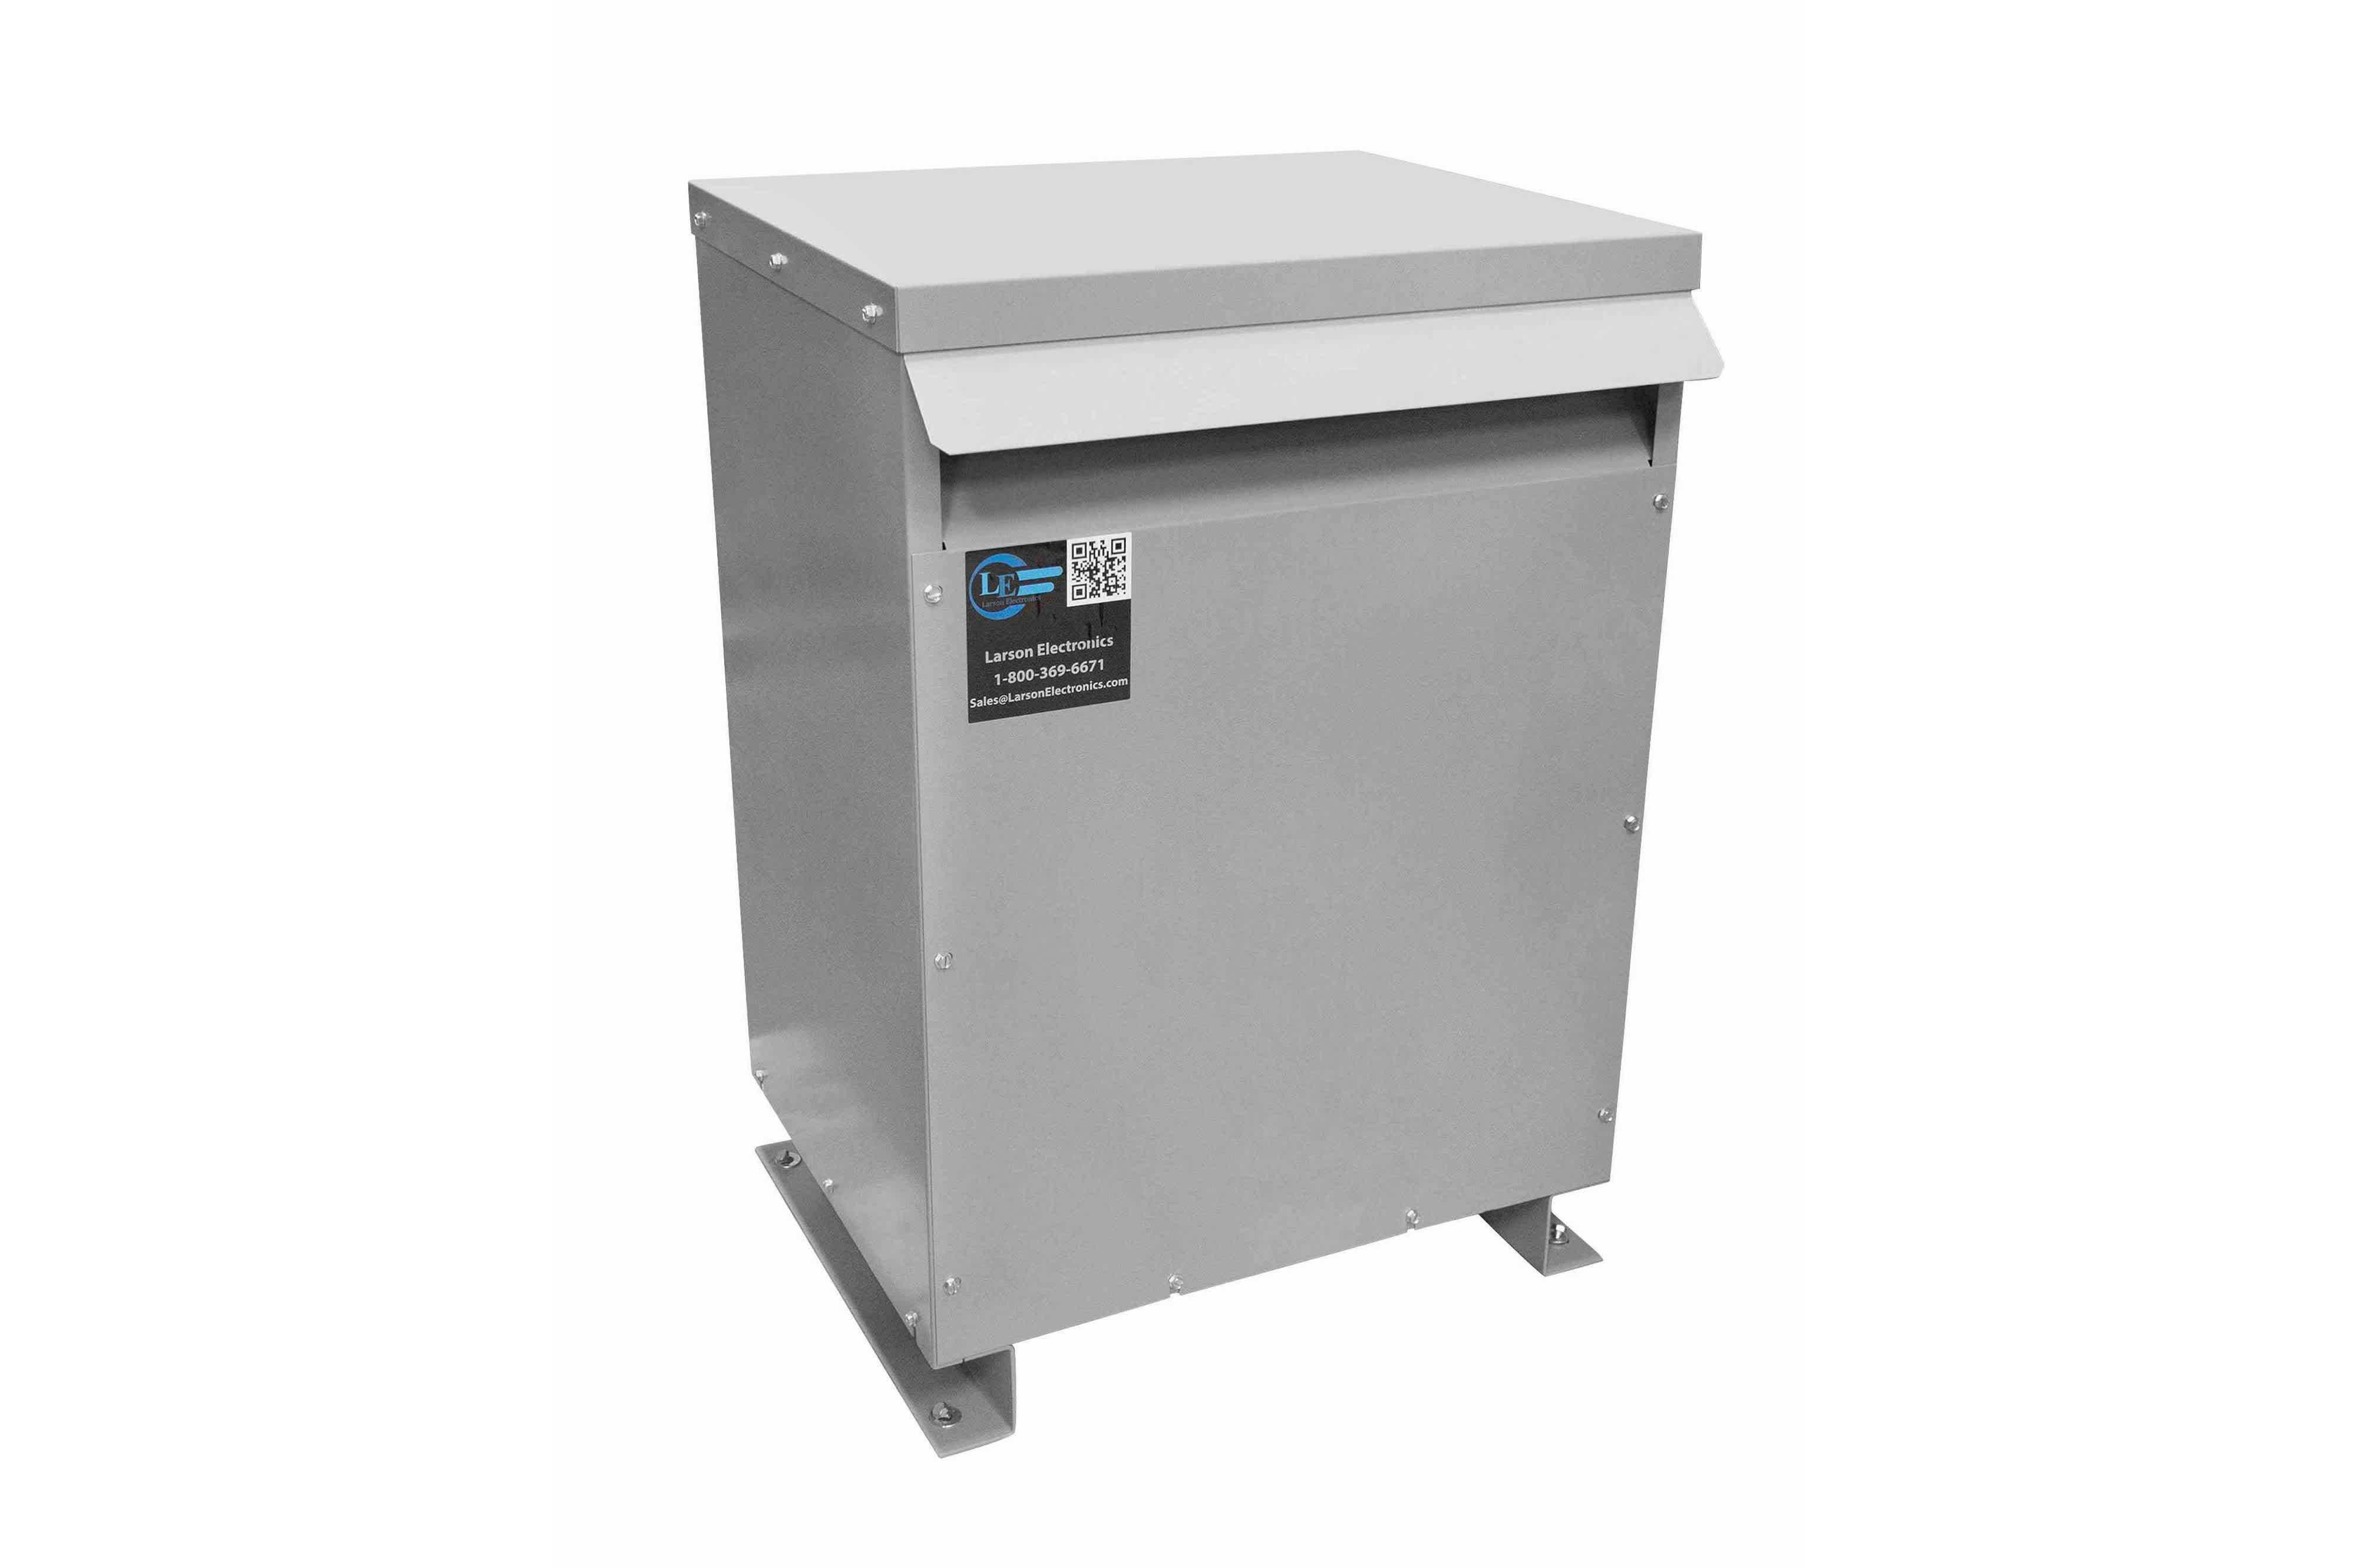 40 kVA 3PH Isolation Transformer, 230V Wye Primary, 480Y/277 Wye-N Secondary, N3R, Ventilated, 60 Hz